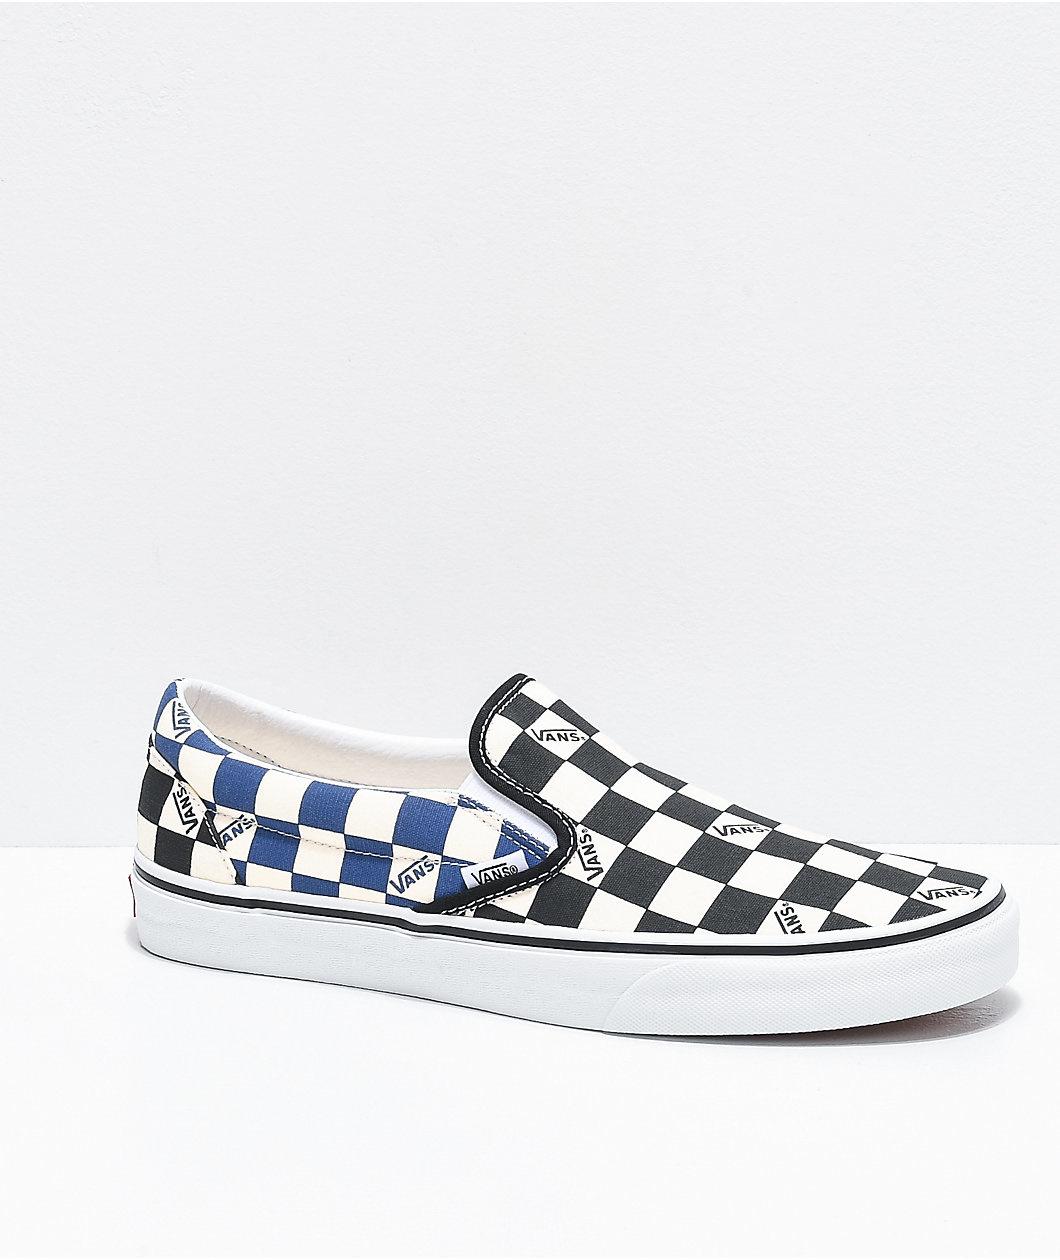 Vans Vans Slip-On Big Check Black/Navy Shoes